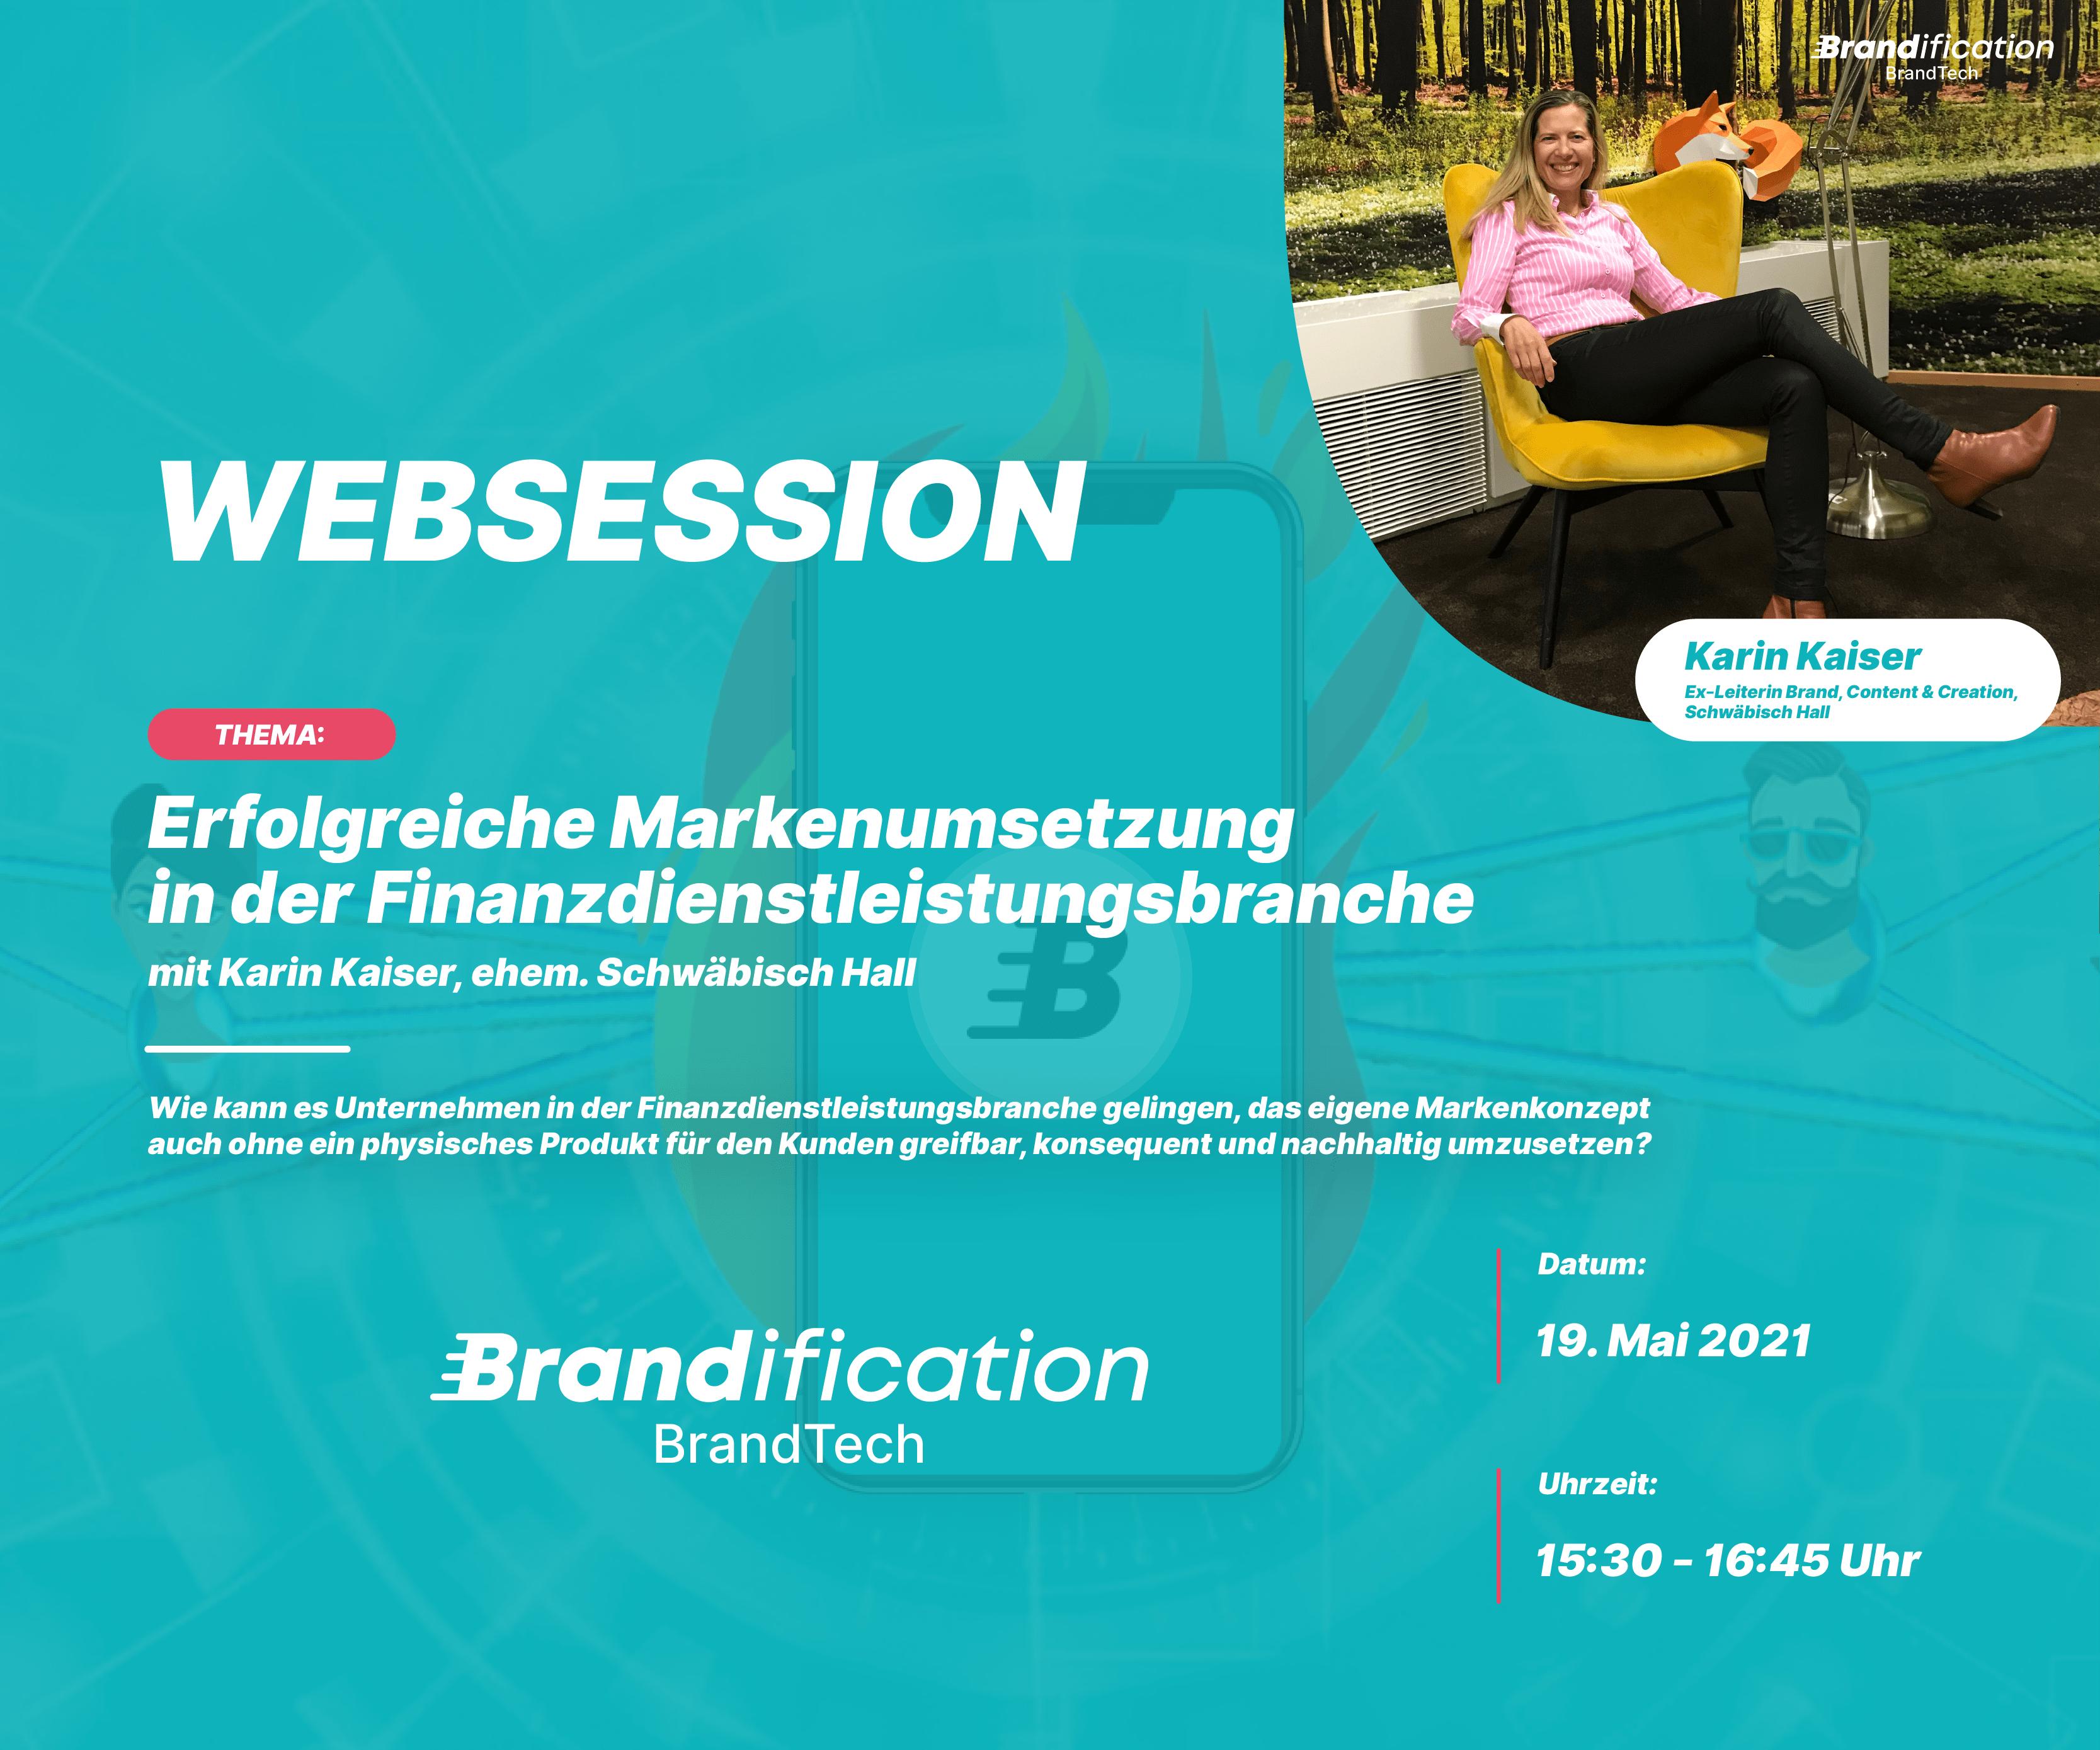 Brandification Websession mit Karin Kaiser